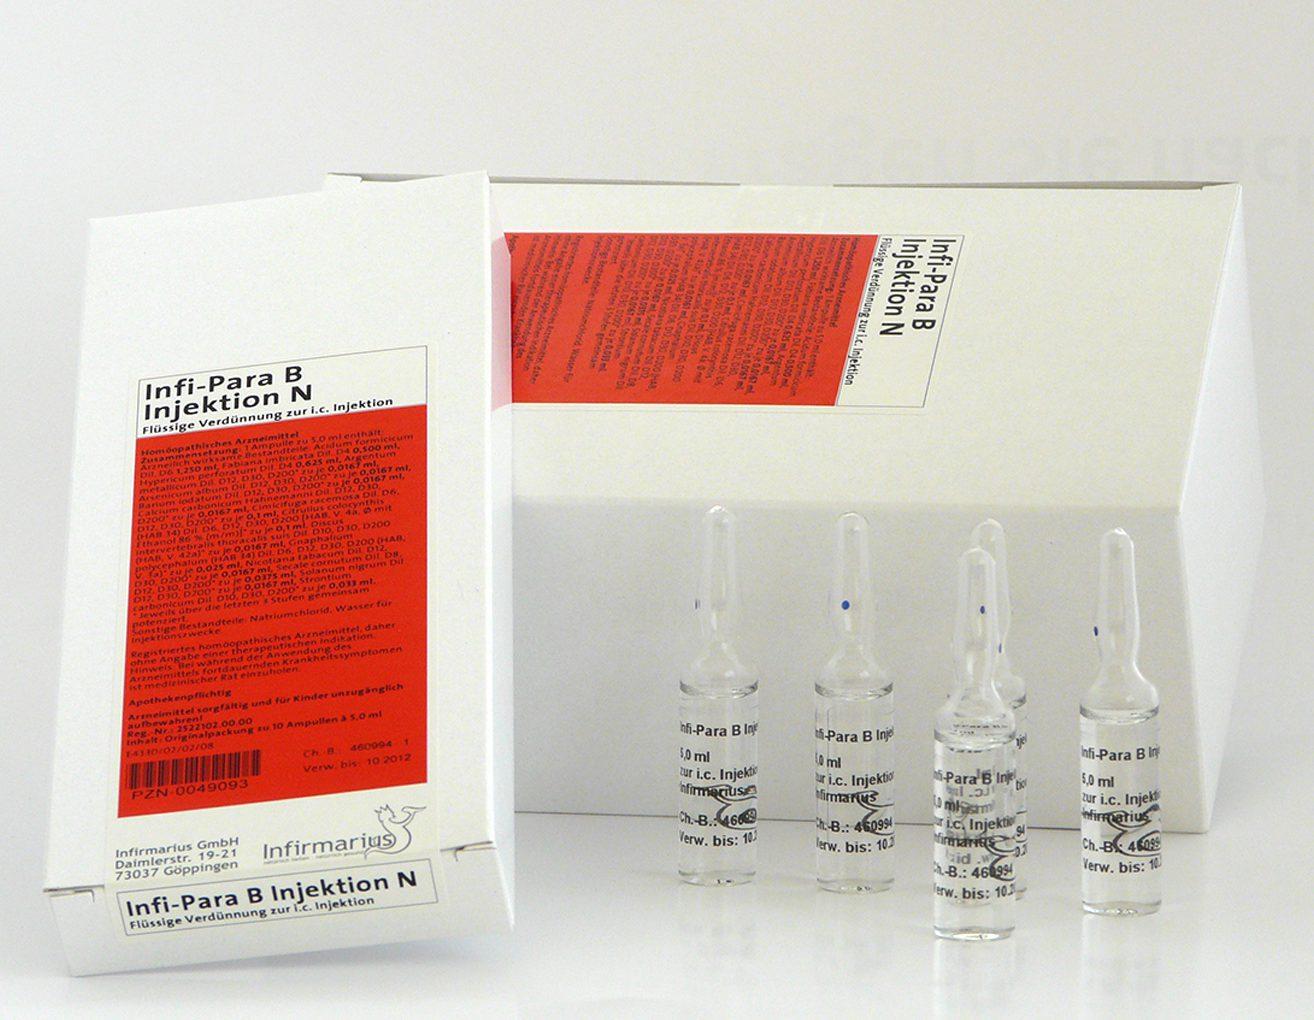 Infi-Para B Injektion N